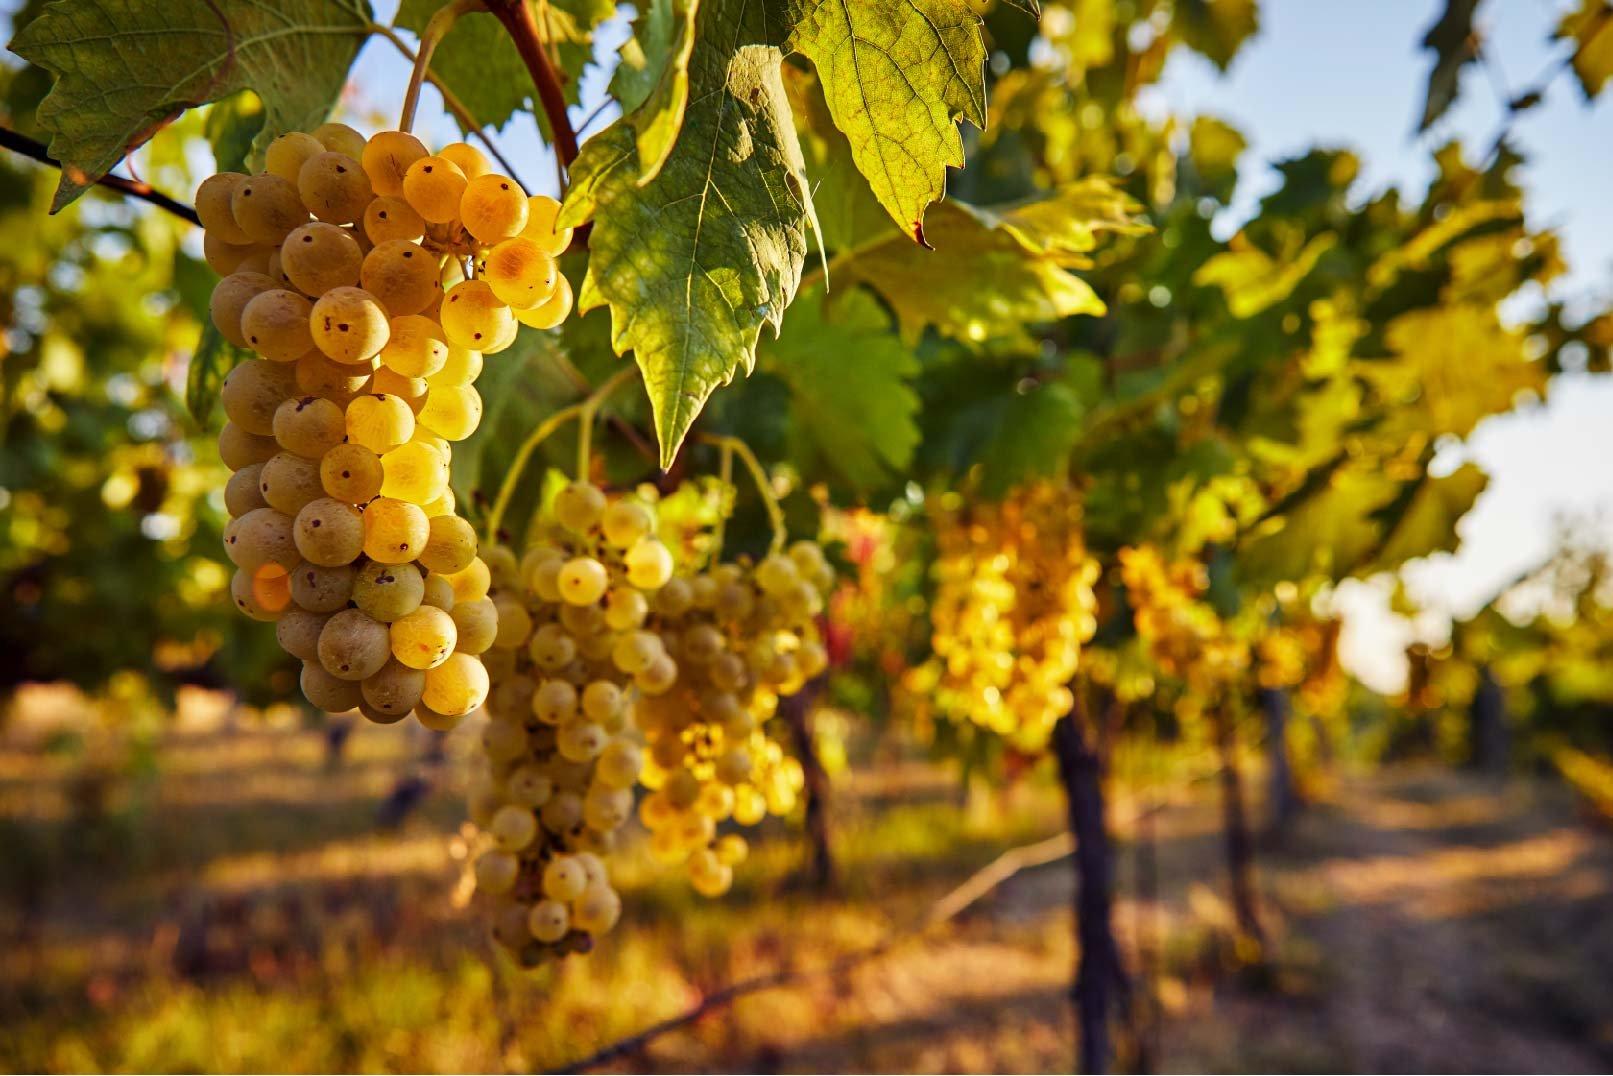 grapes_on_vine-smaller